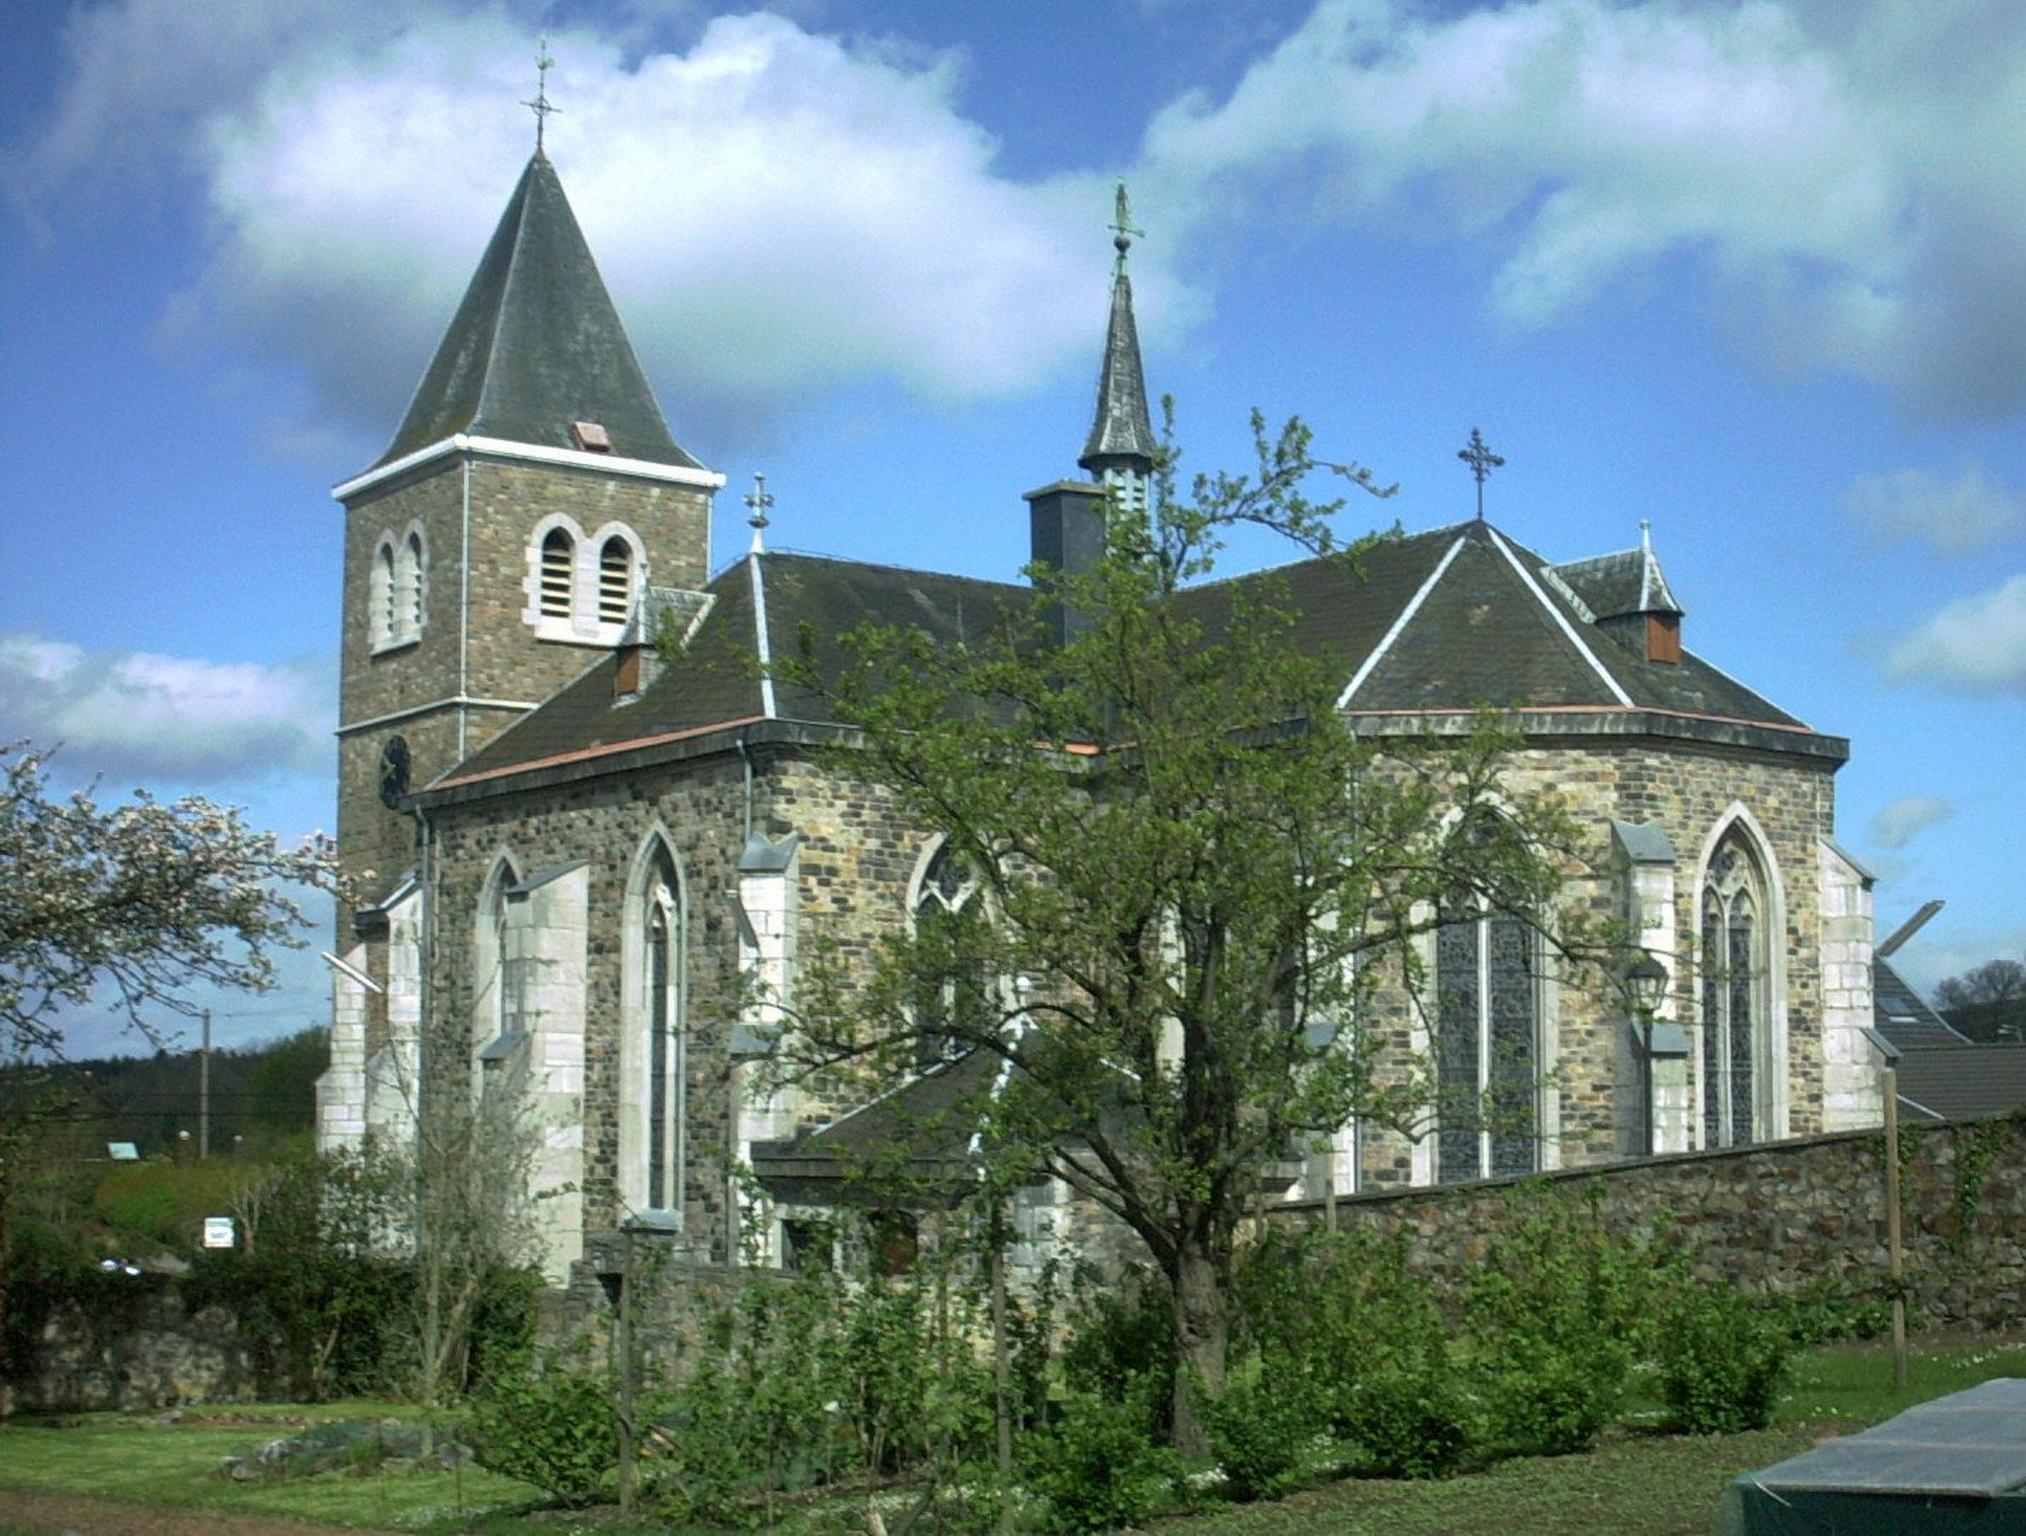 St. Rochus Hauset